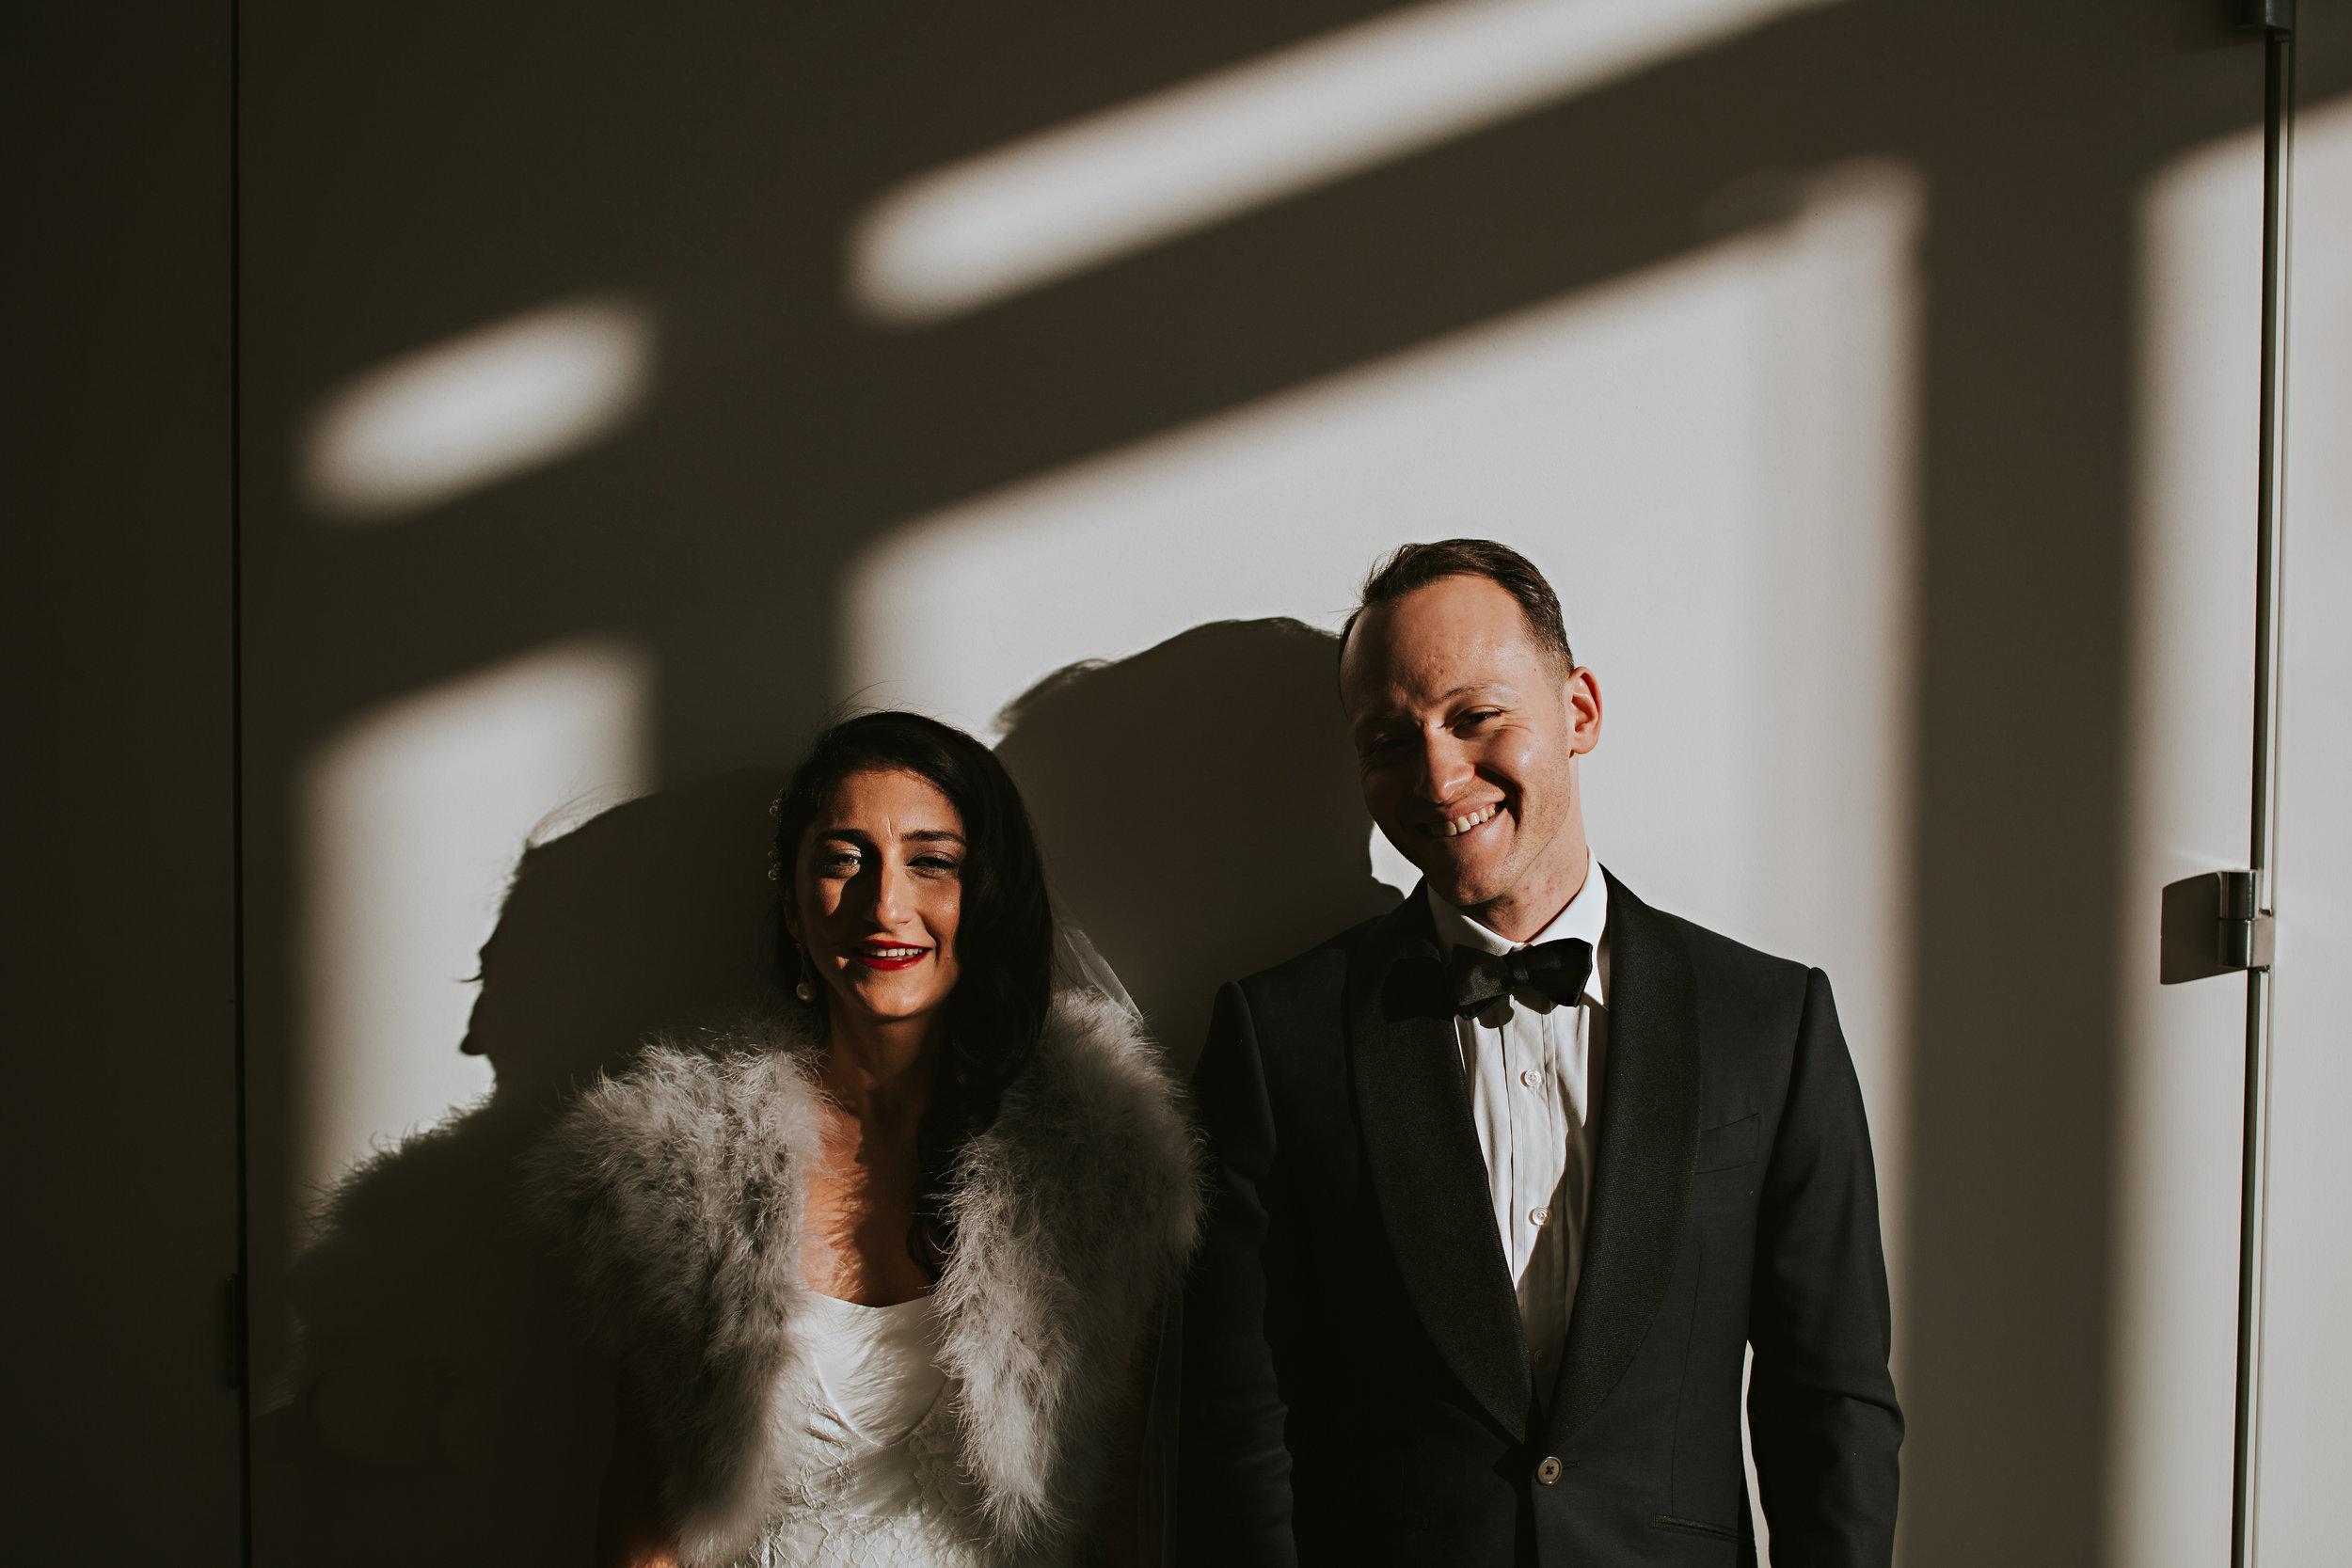 Greg + Nika rachel gulotta photography -201.jpg